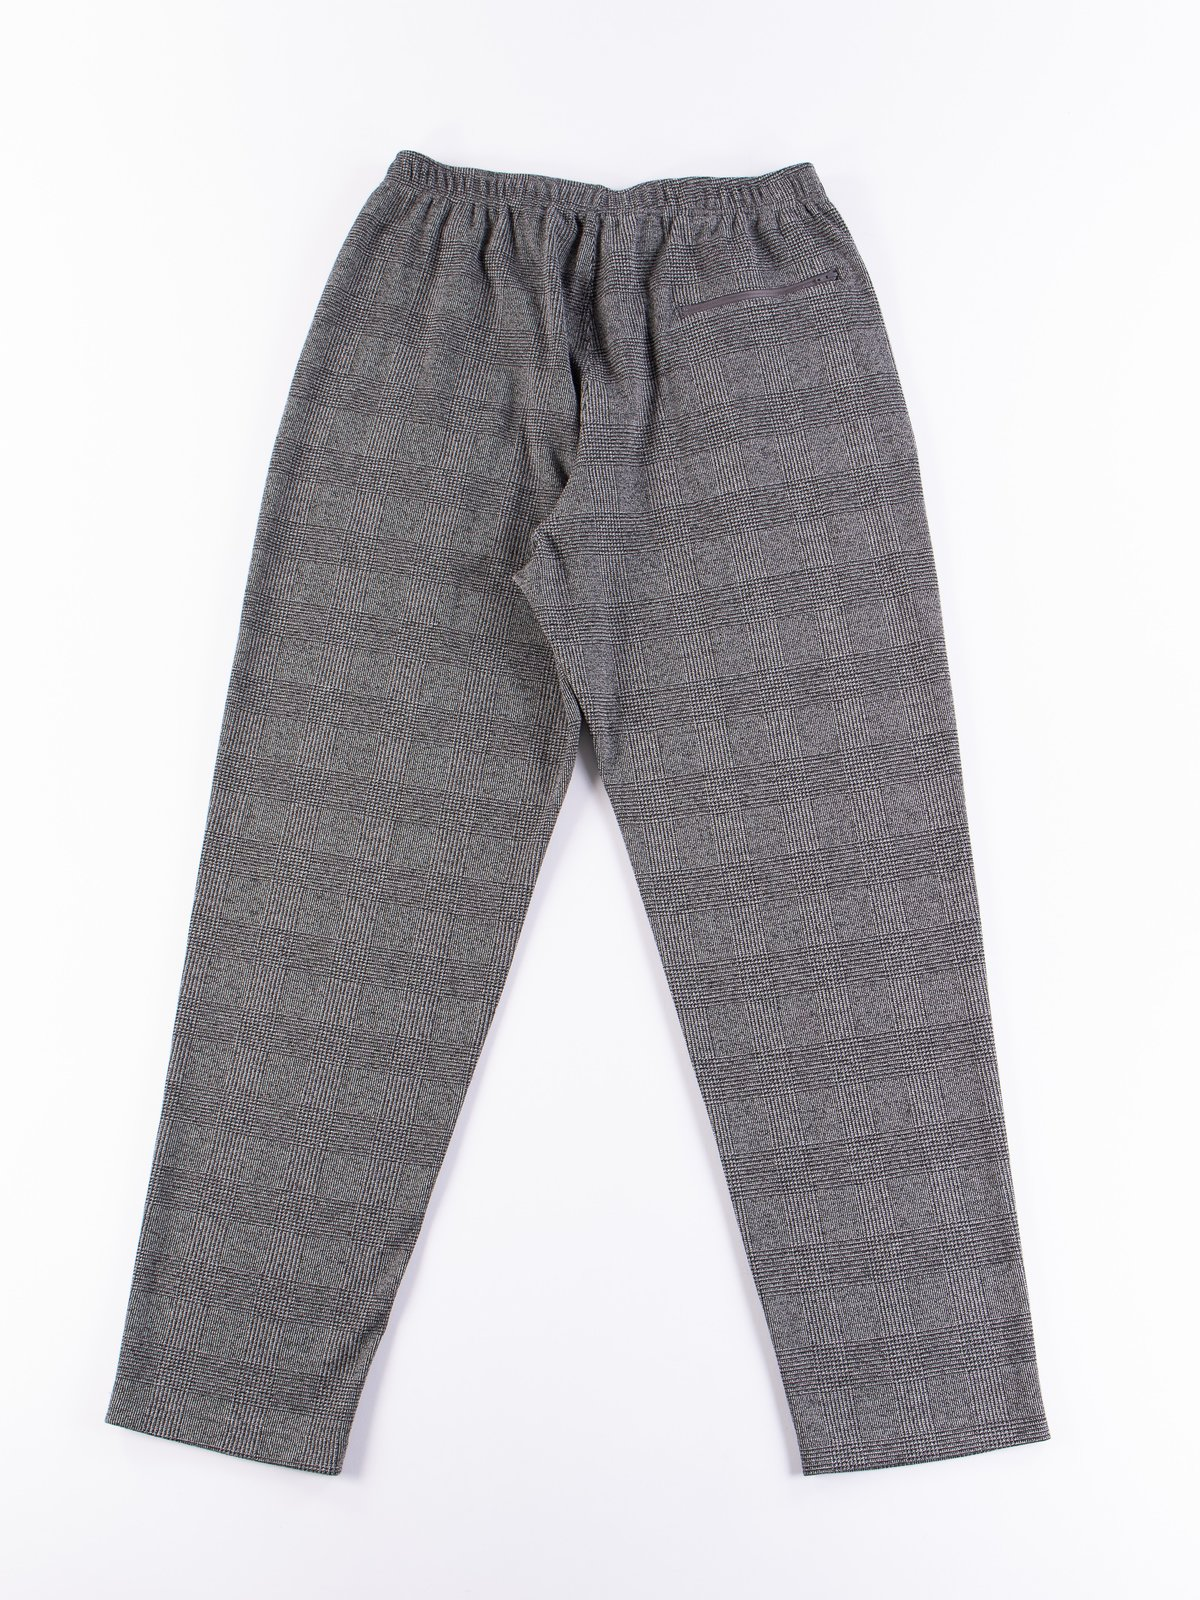 Grey PC Knit Glen Plaid Jog Pant - Image 8